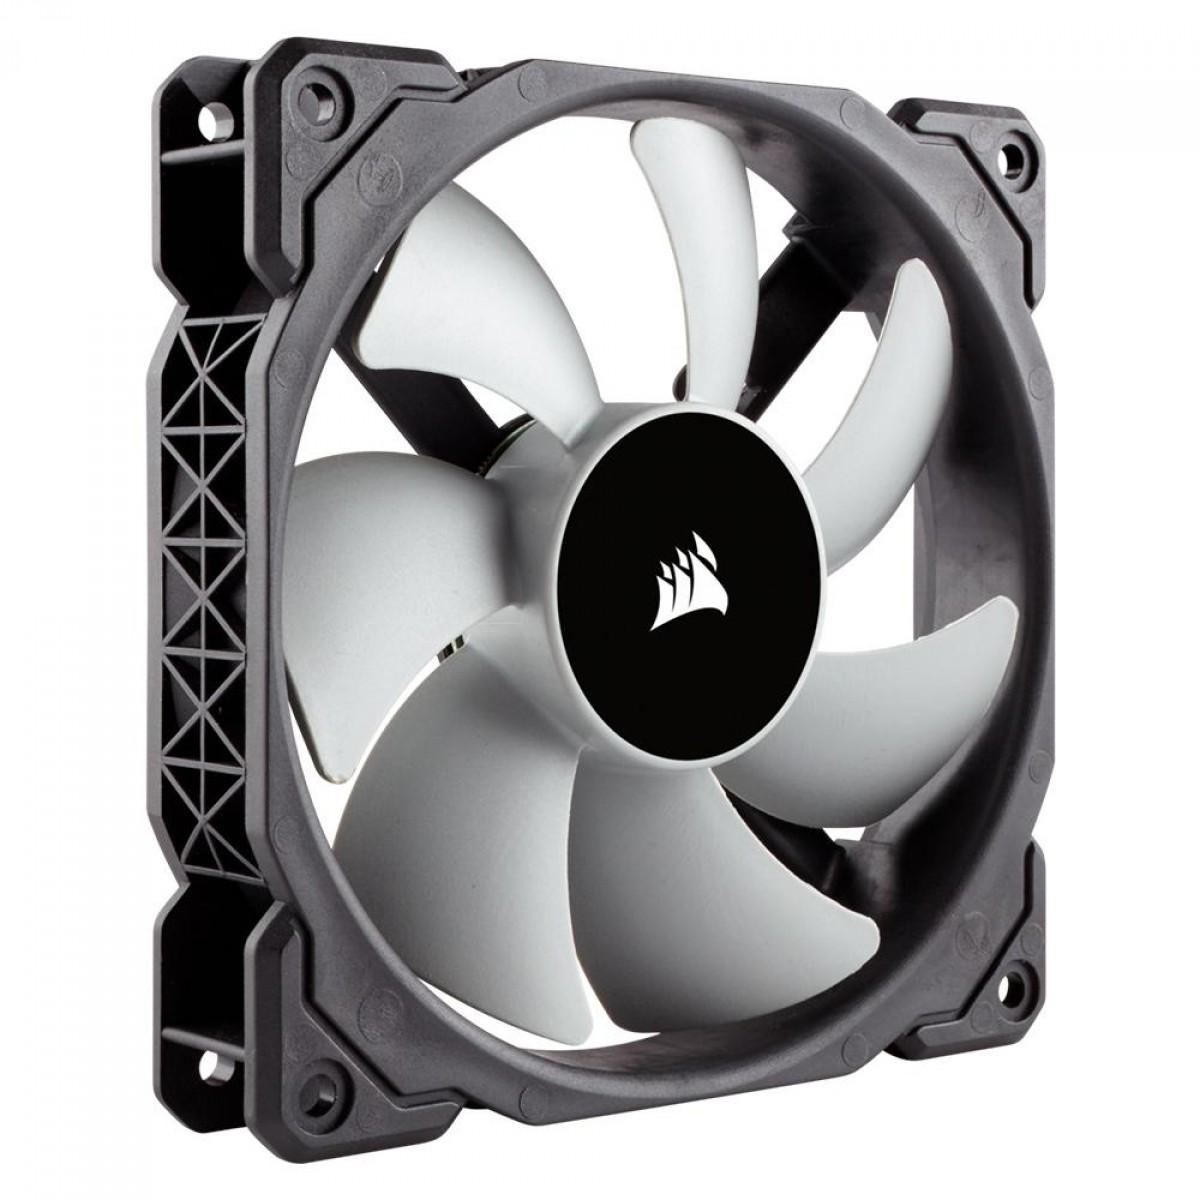 Cooler para Gabinete Corsair ML140 Premium, 140mm, CO-9050050-WW